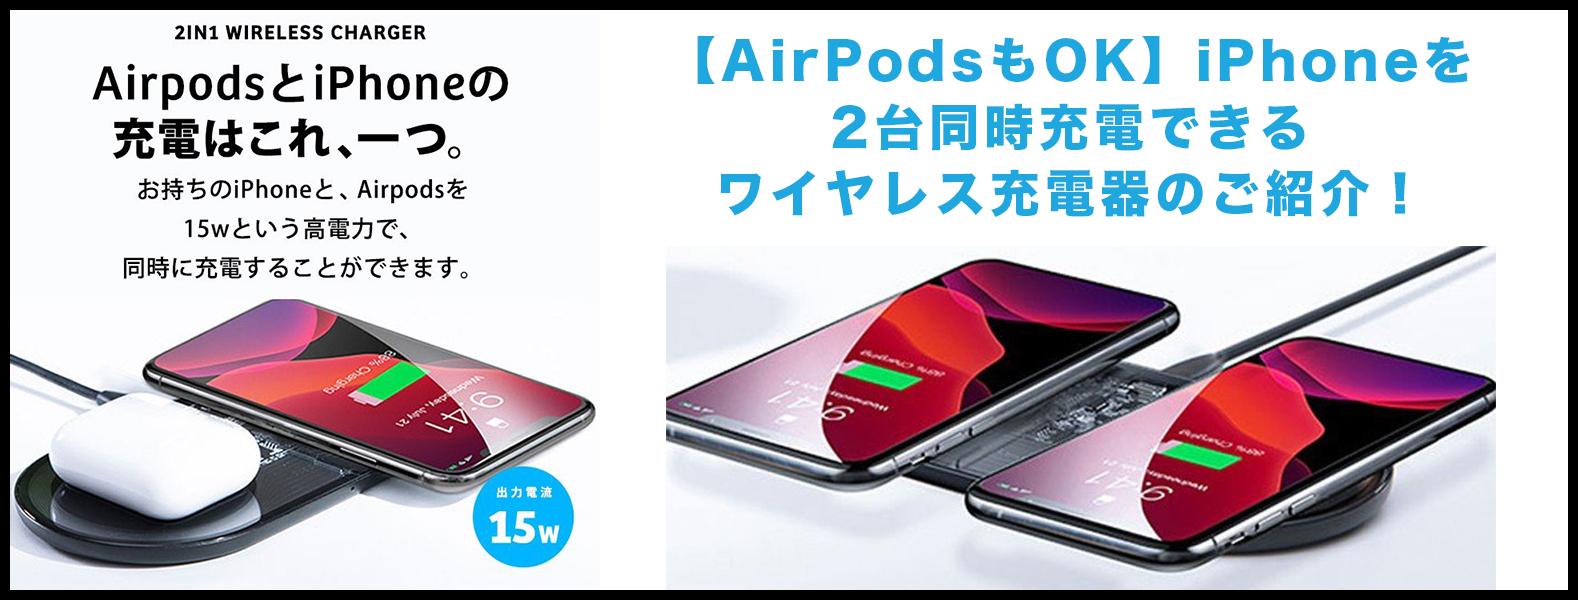 【AirPodsもOK】iPhoneを2台同時充電できるワイヤレス充電器のご紹介!